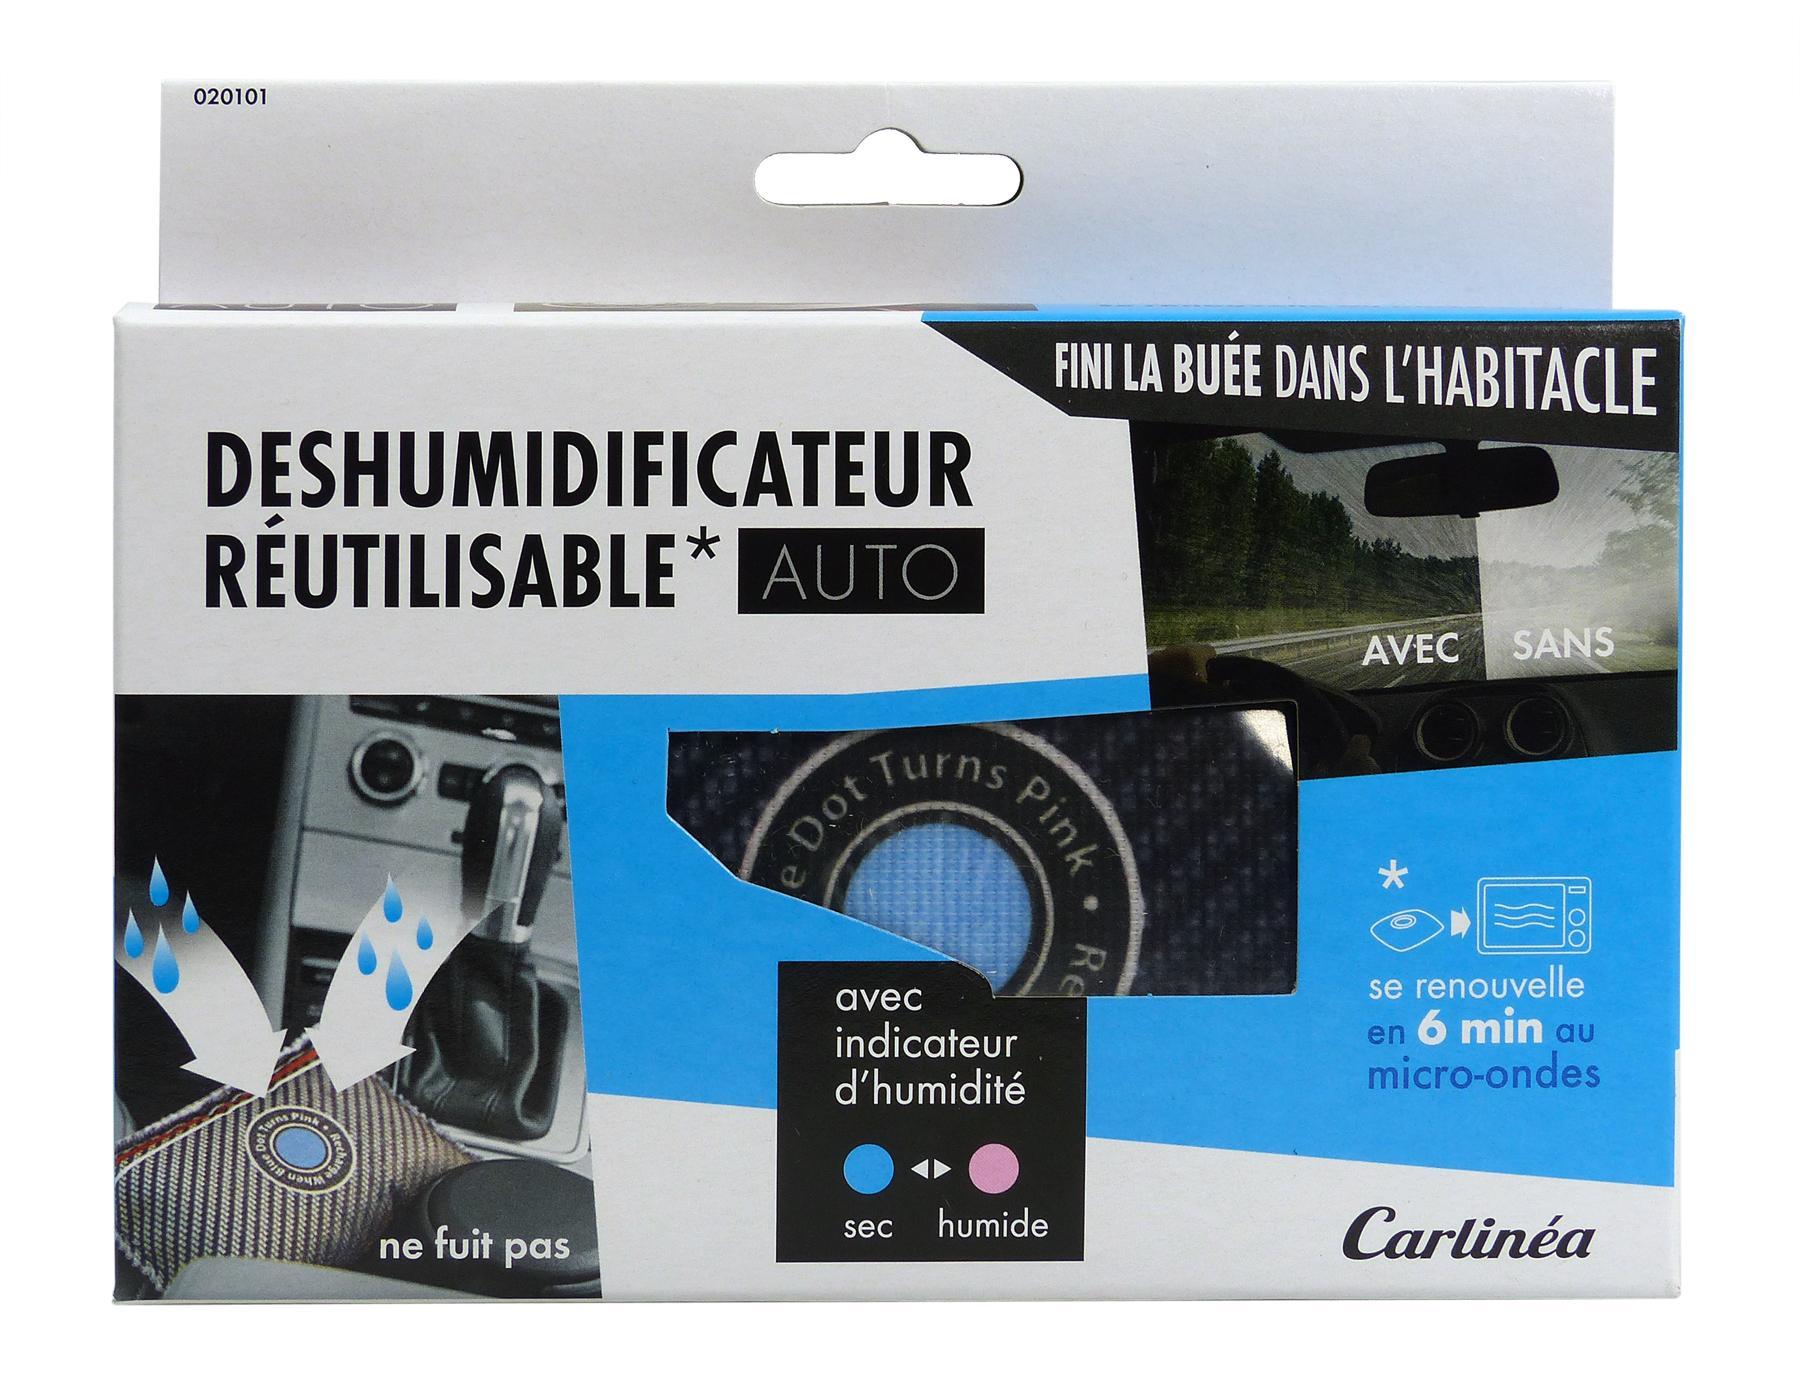 Car dehumidifier Carlinea 020101 3221320201015